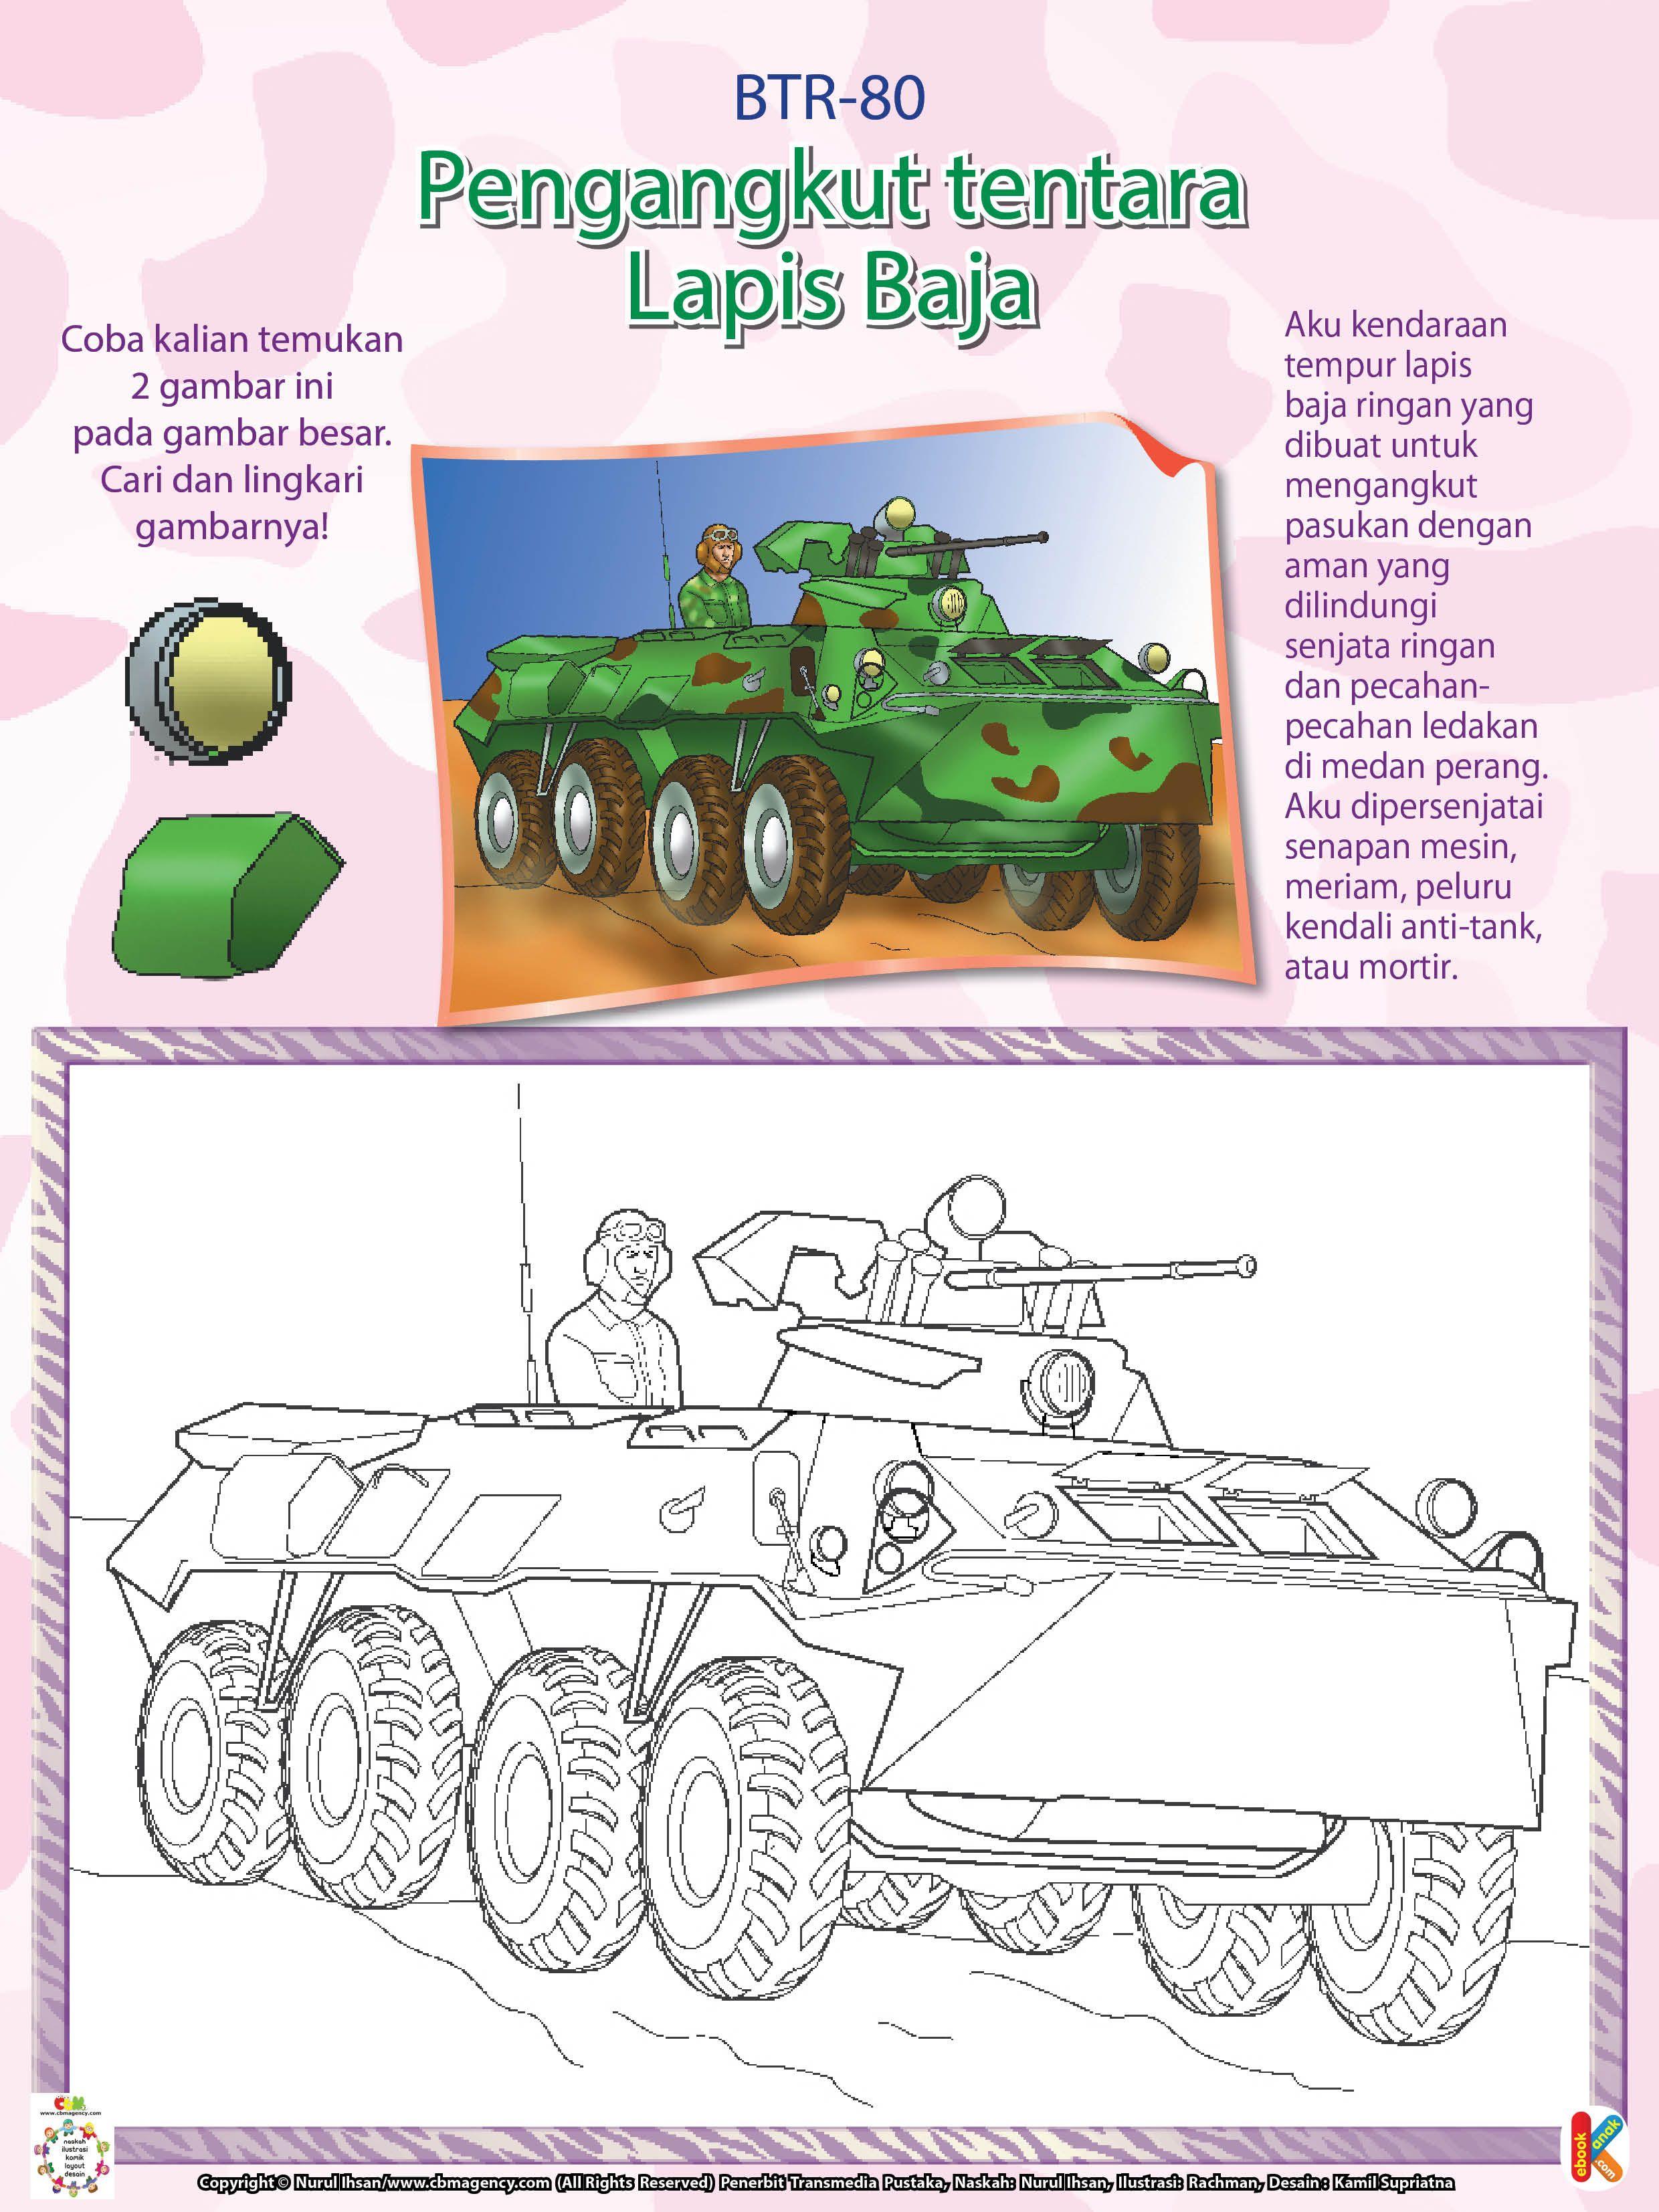 Kendaraan Perang Lapis Baja Btr80 Dengan Gambar Perang